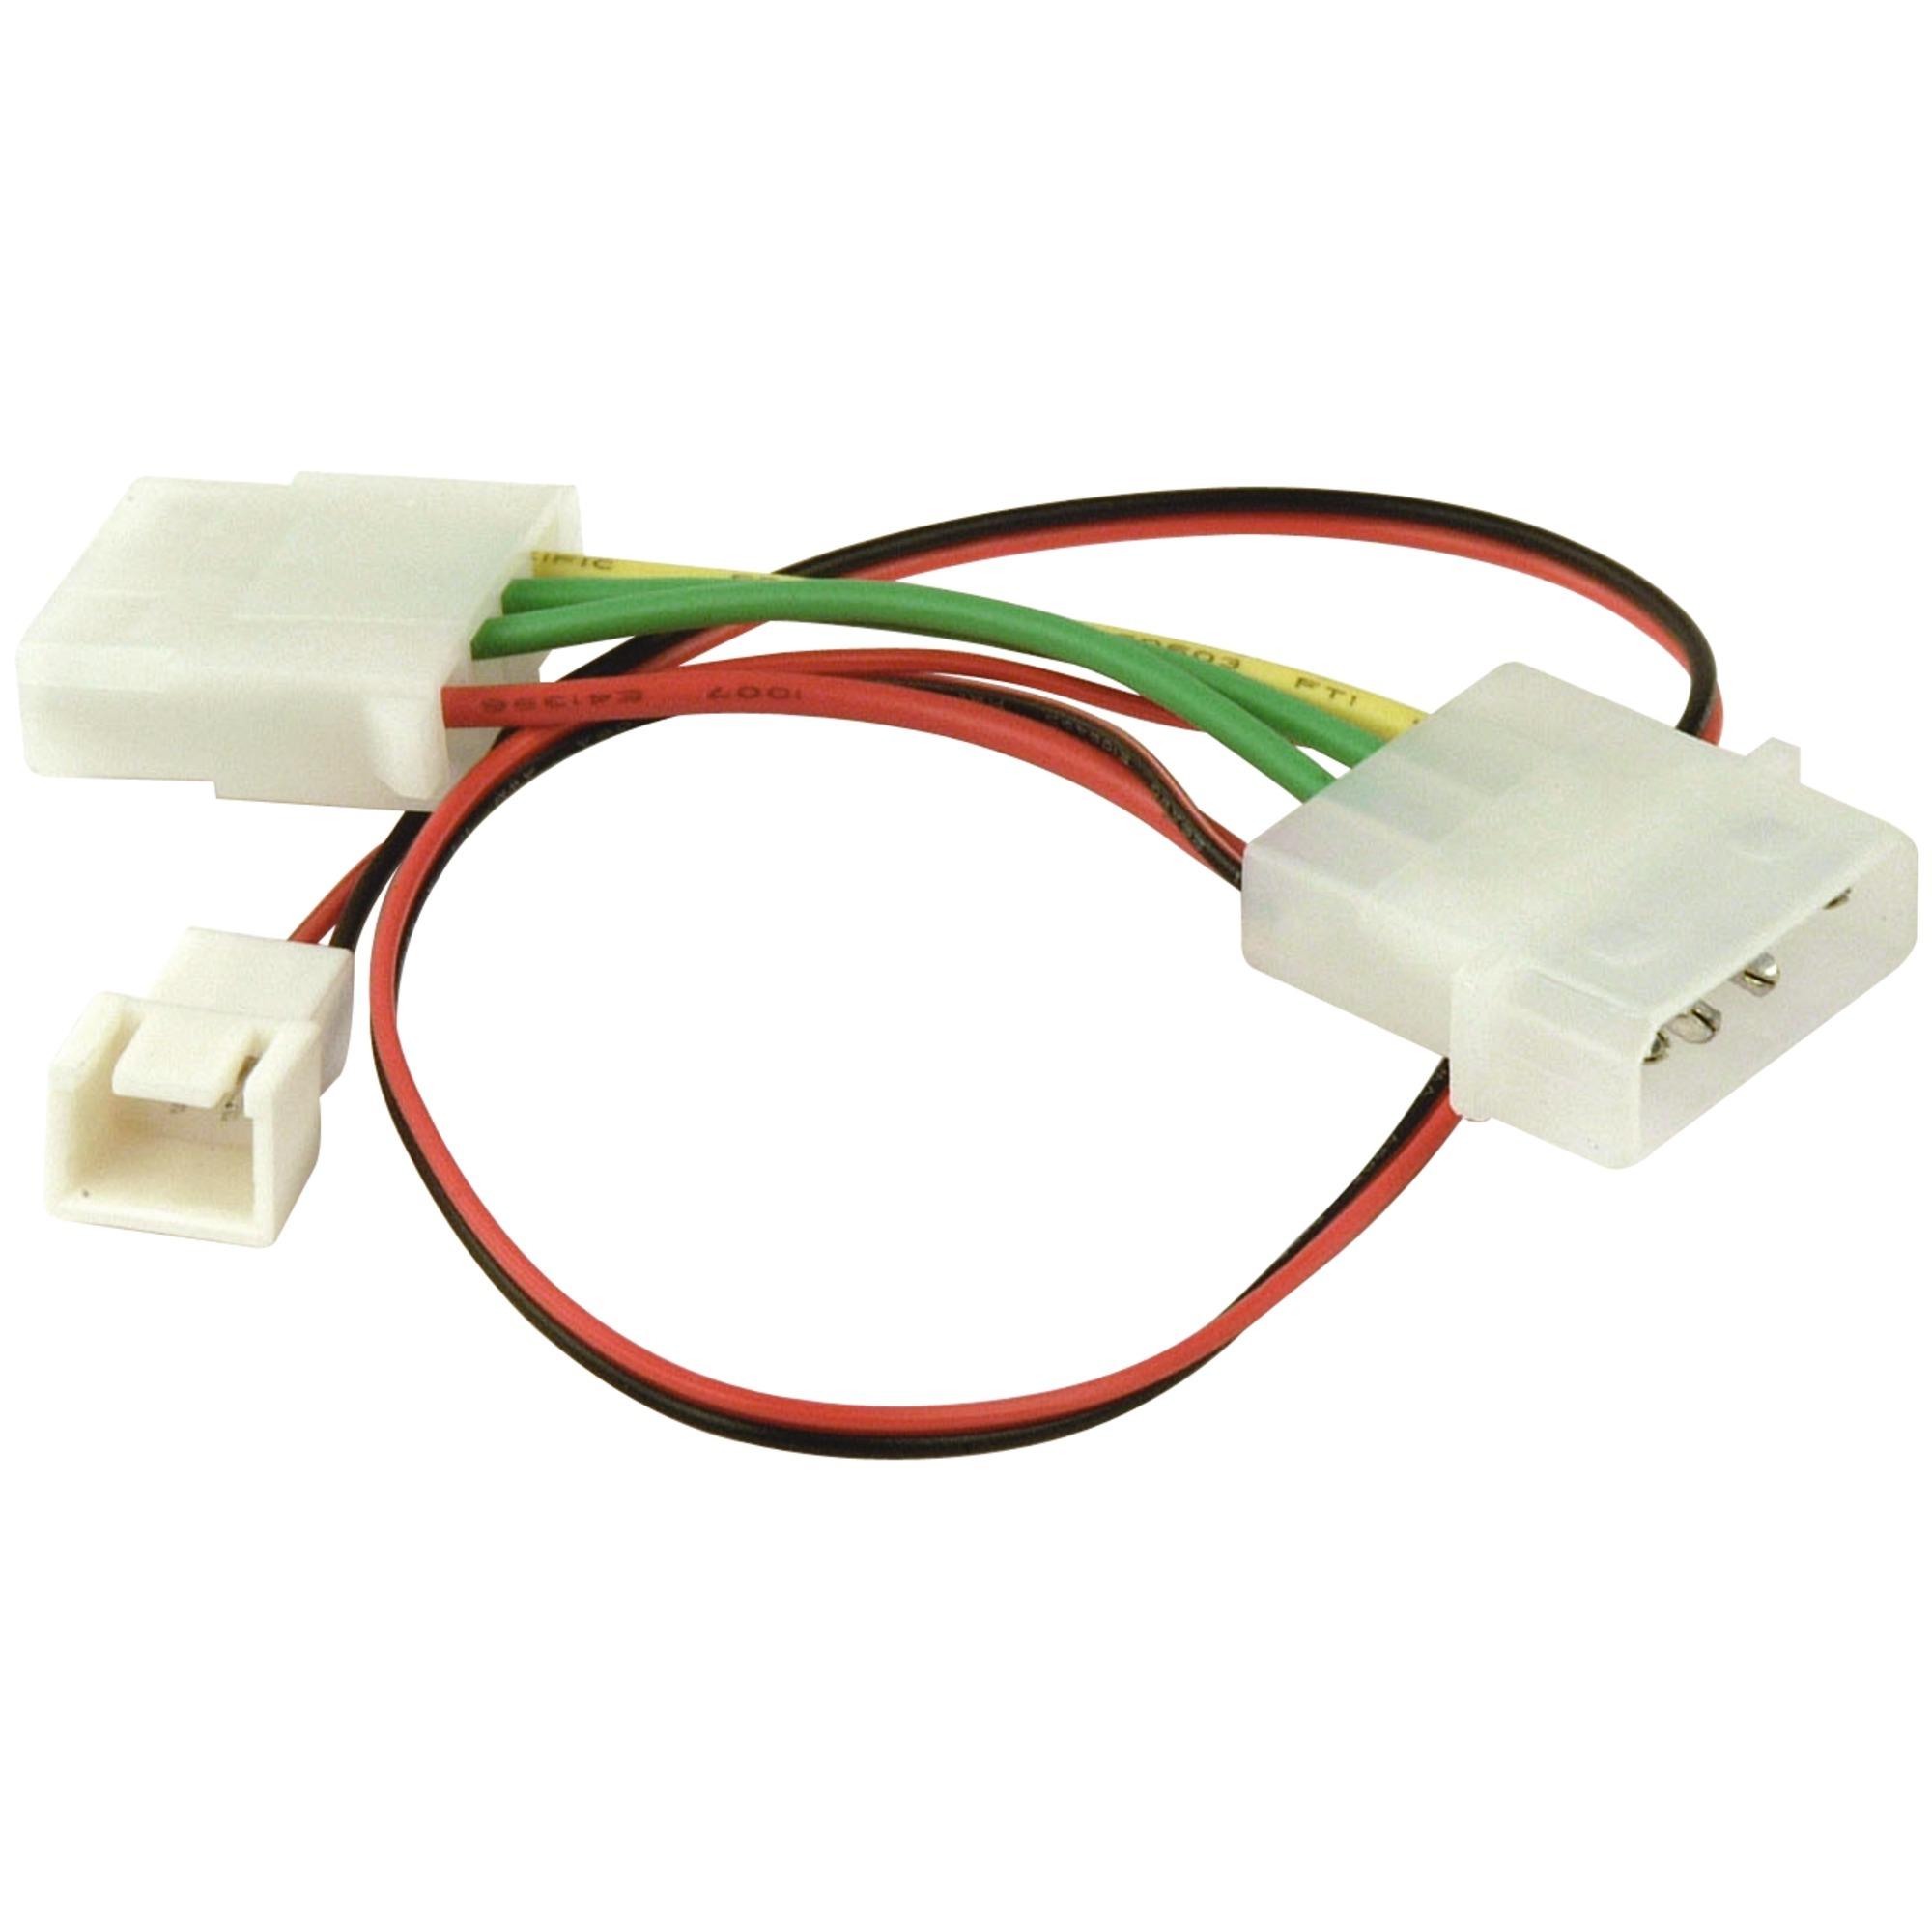 12-v-7-v-adaptor-kabelinterface-samt-han-og-hun-adaptor-adapter